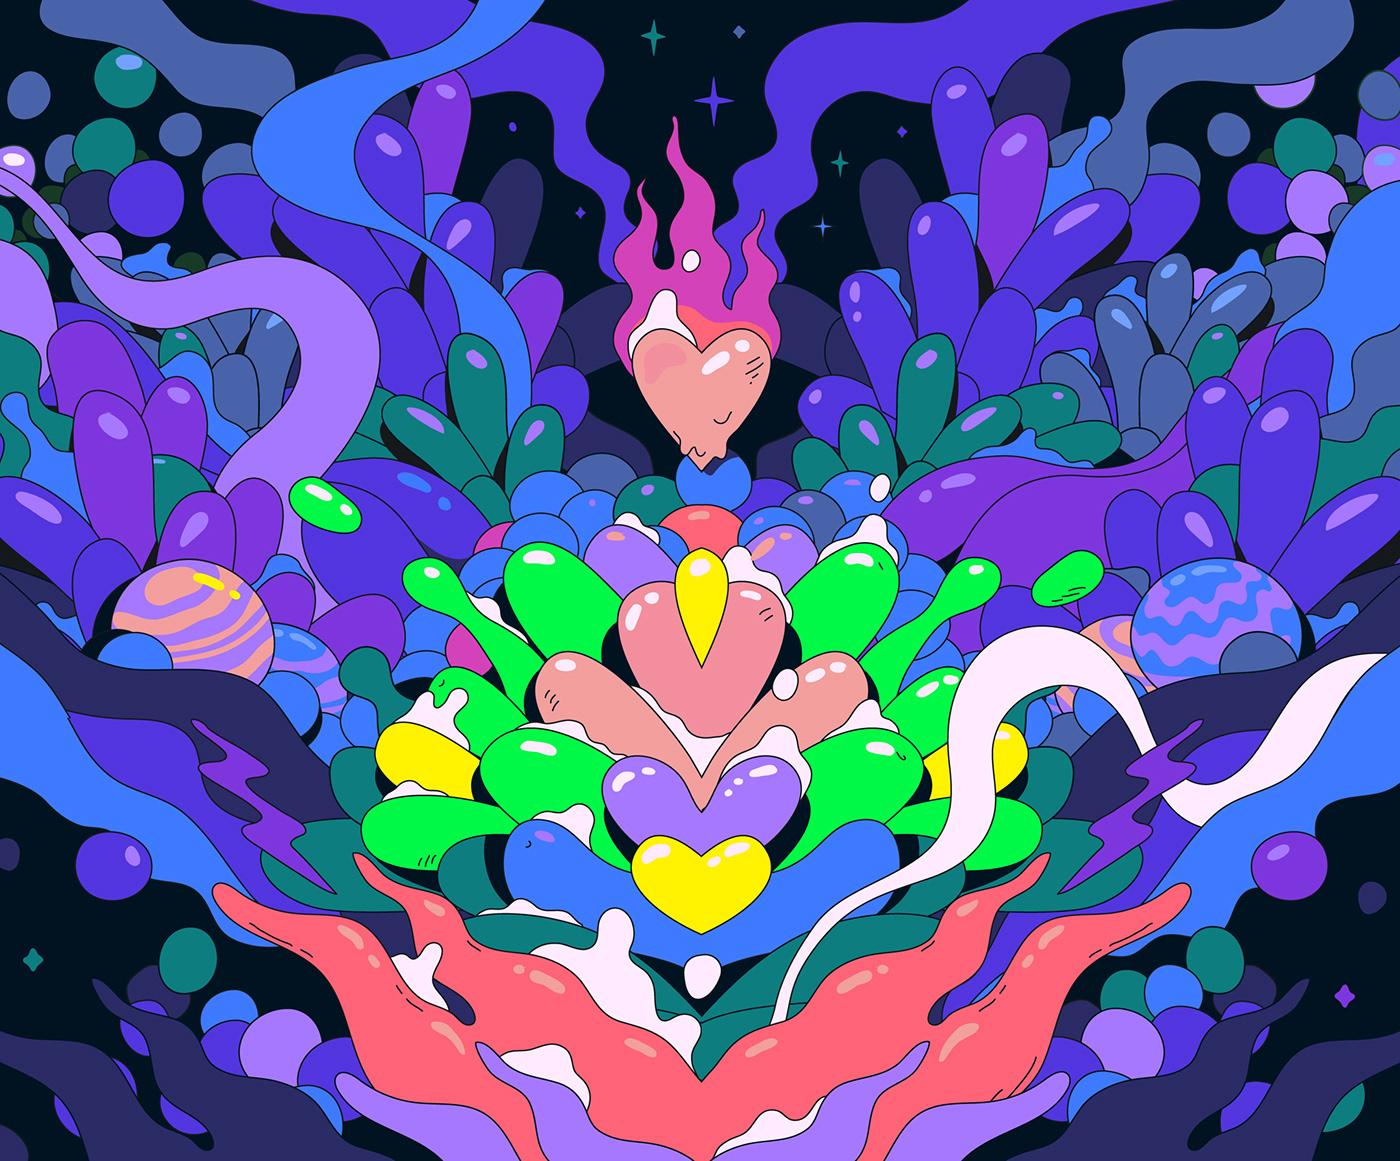 surreal Sci Fi Pop Art neon Digital Art  Space  Character cartoon animation  abstract